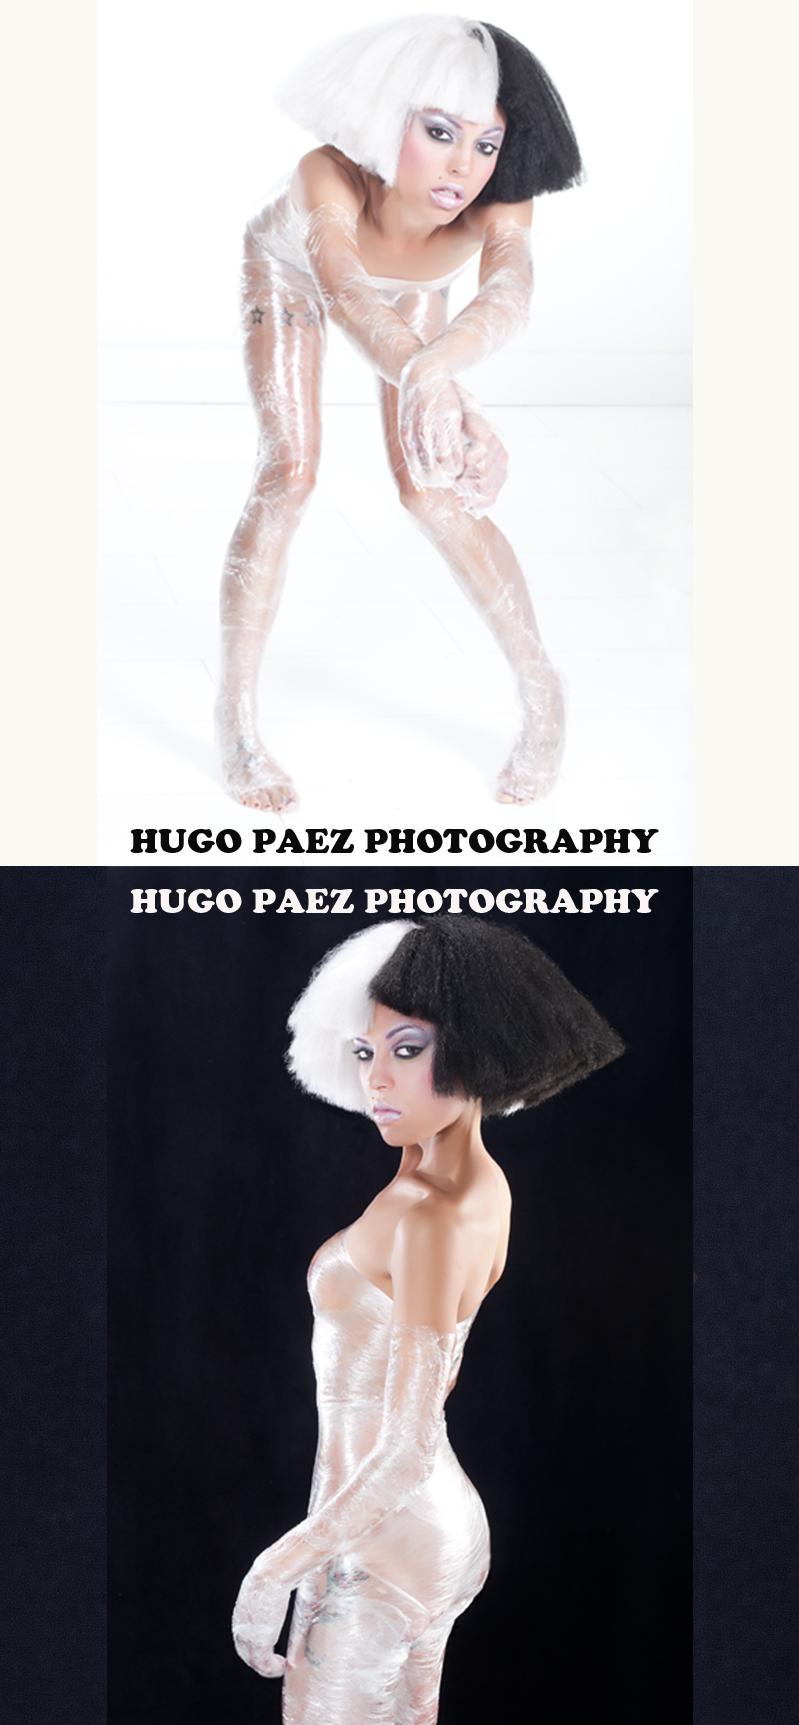 Hugo Salon 2901 Kensington Md Oct 06, 2011 Hugo Paez 2tone